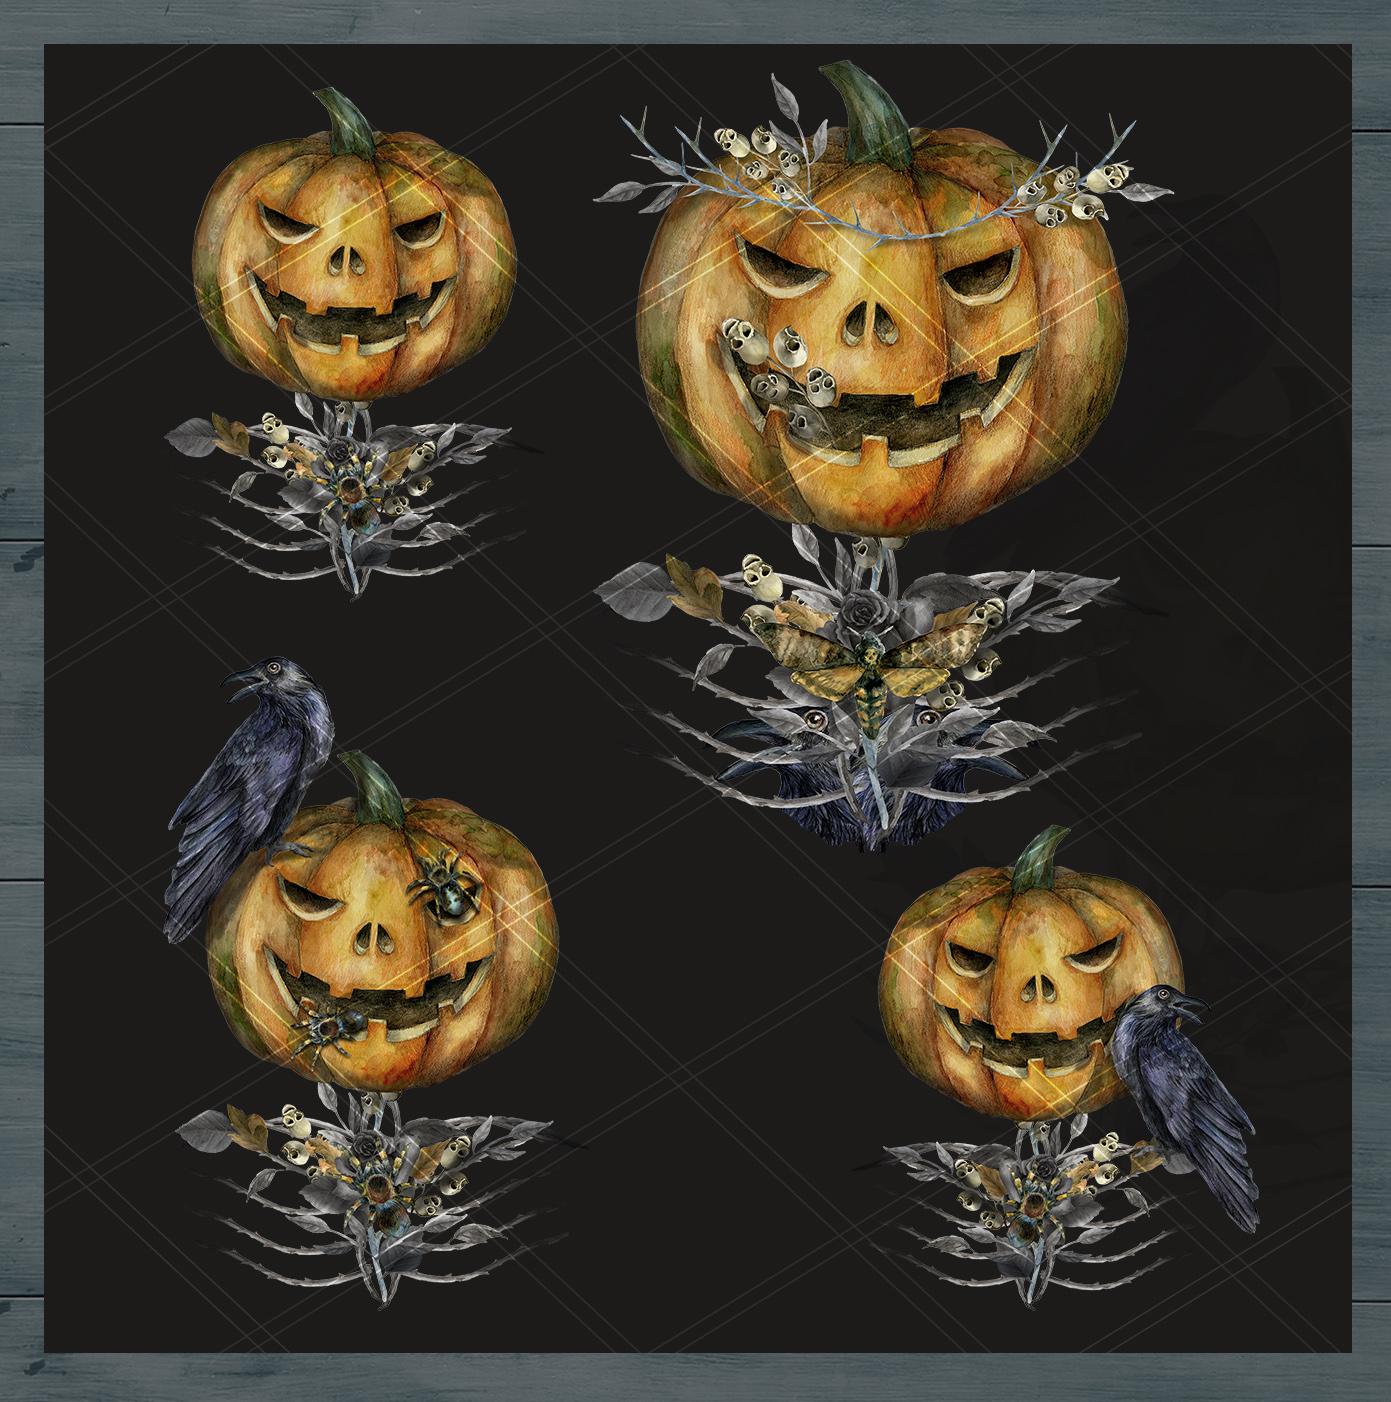 Jack o Lanter Halloween clipart, evil vintage gothic pumpkin example image 2